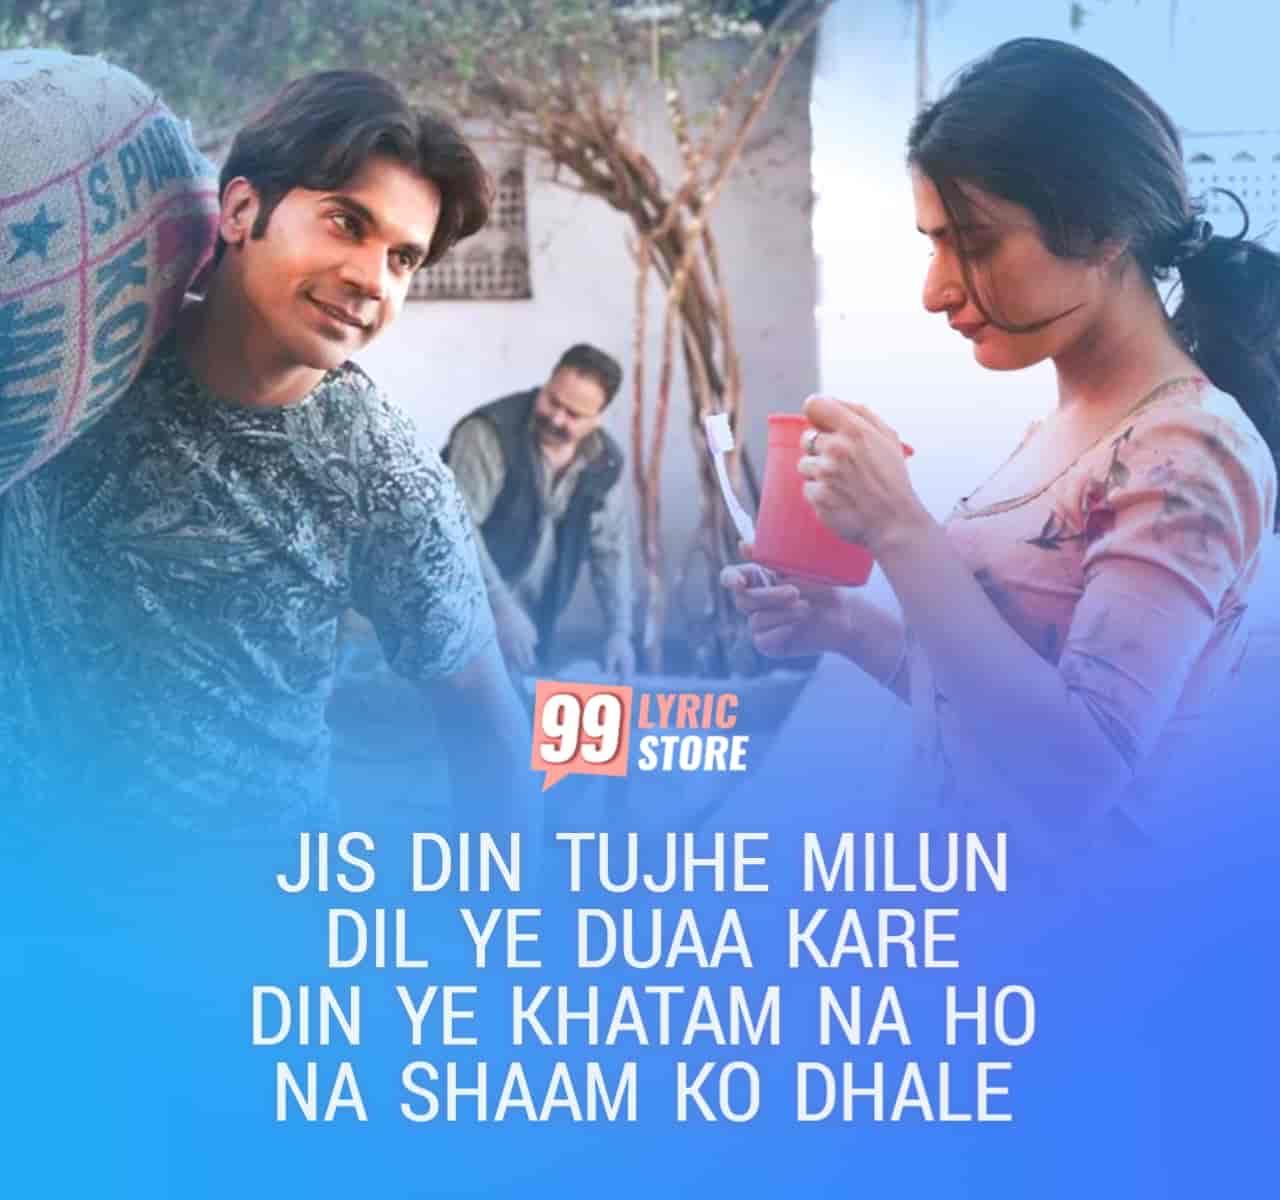 Hardum Humdum Hindi Song Image From Movie Ludo Sung By Arijit Singh